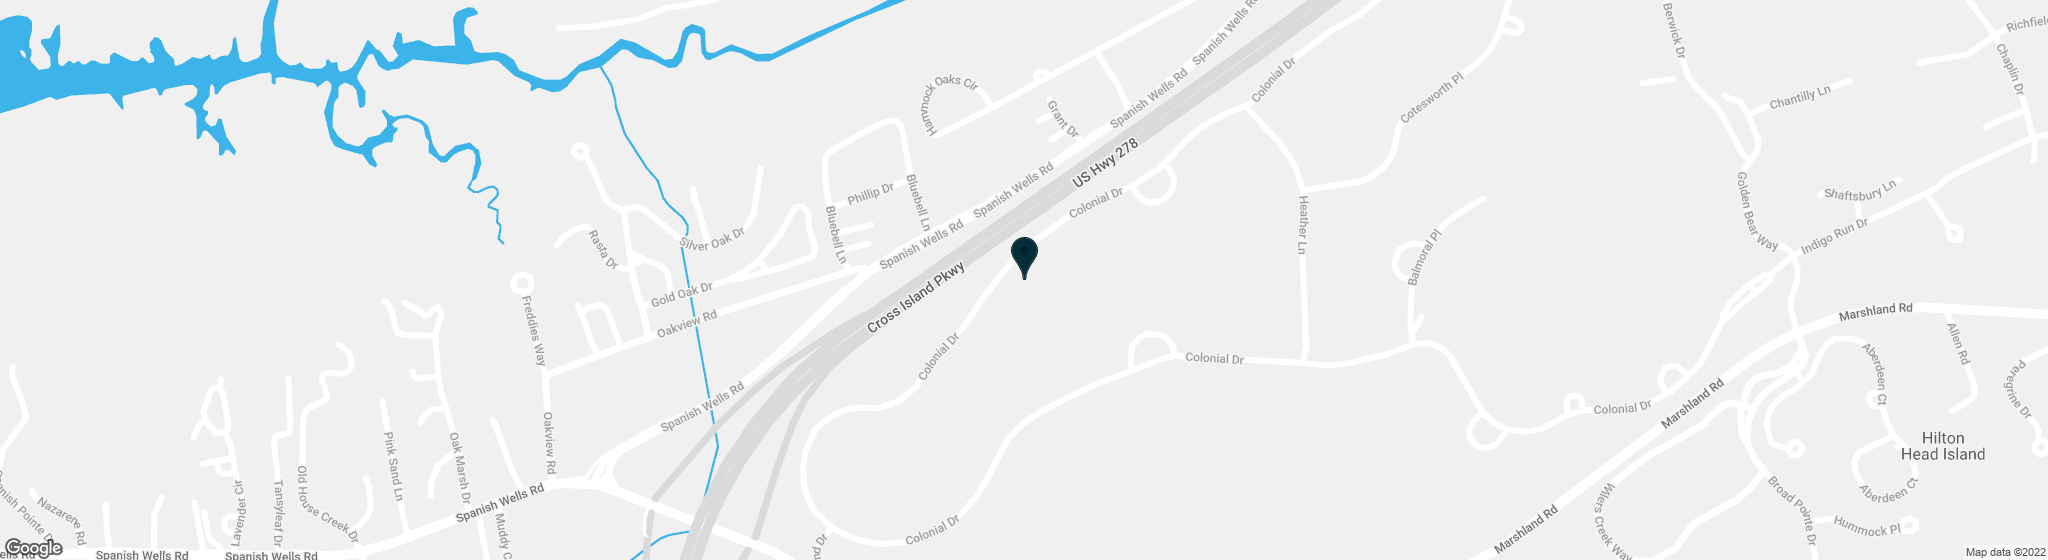 684  Colonial DRIVE Hilton Head Island SC 29926